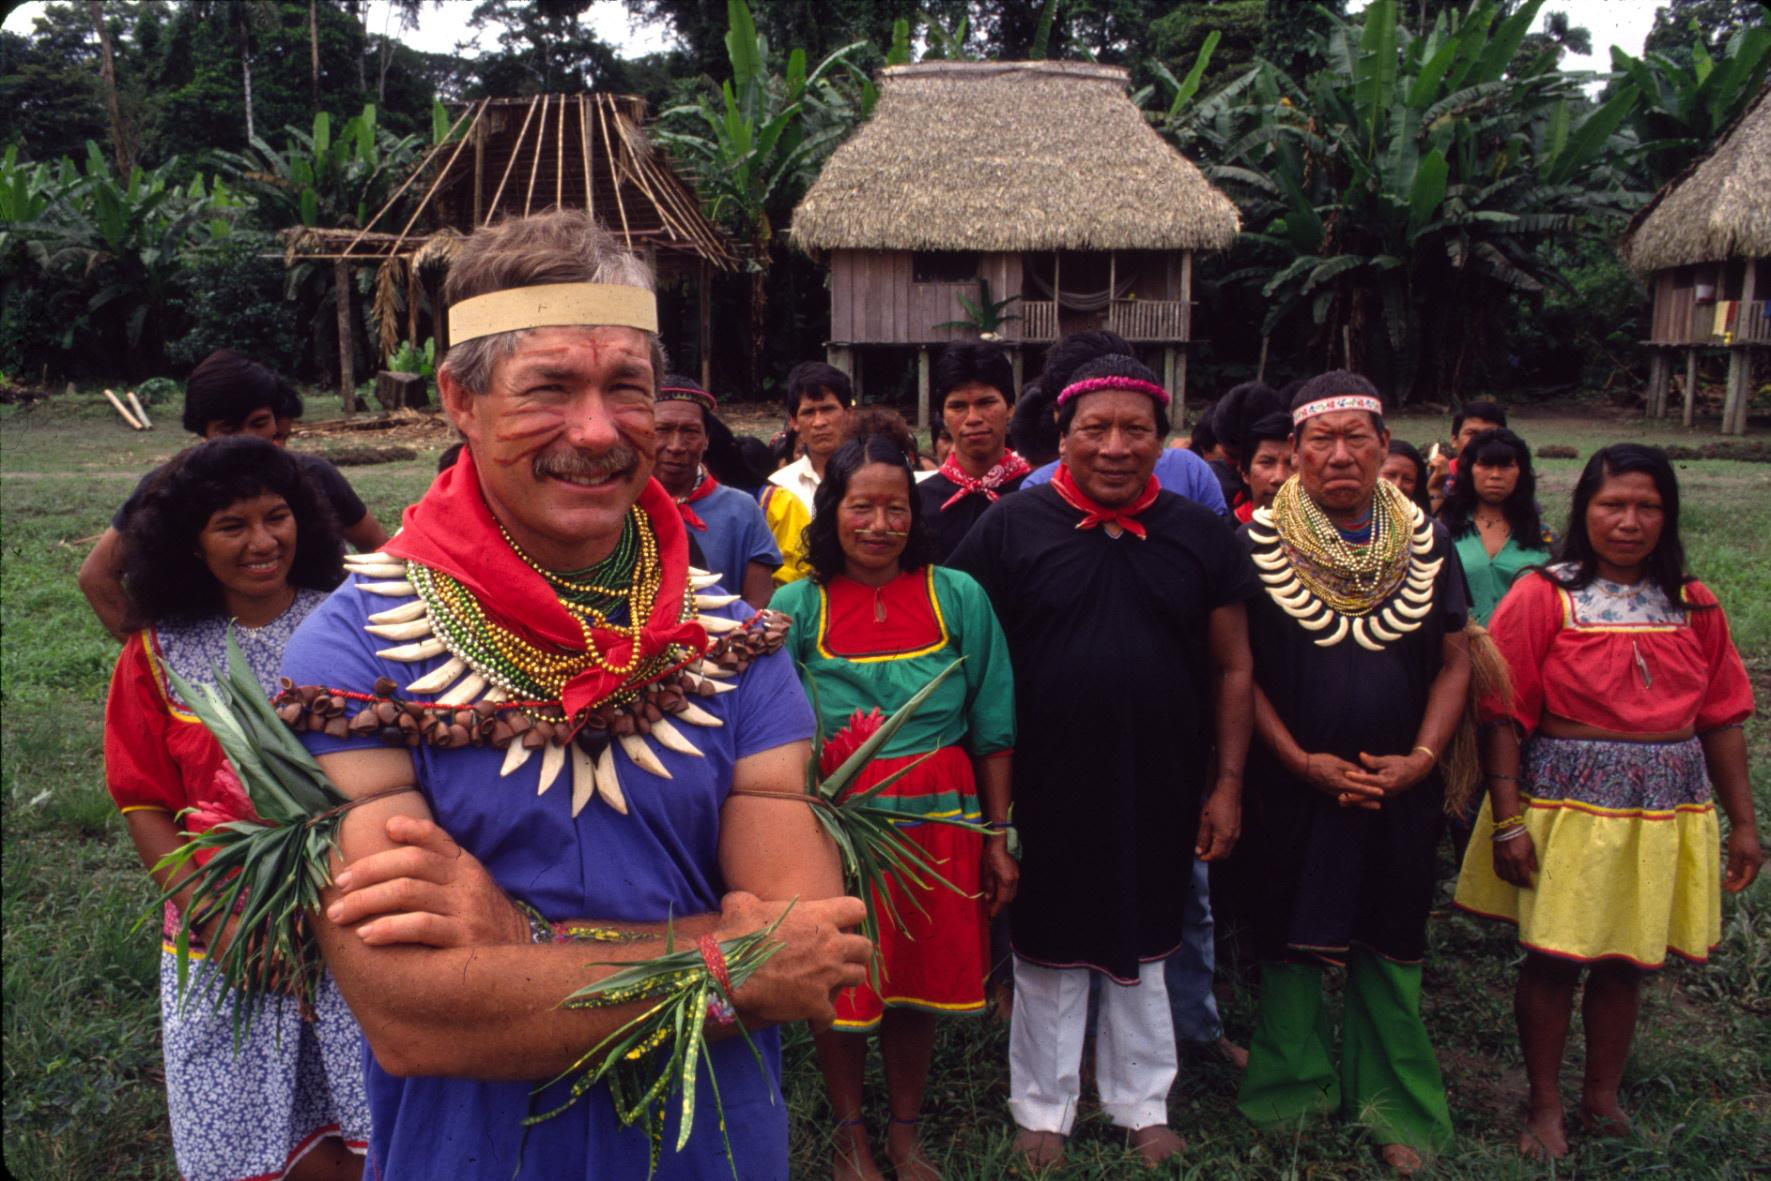 Randy with members of the Cofan community of Zábalo